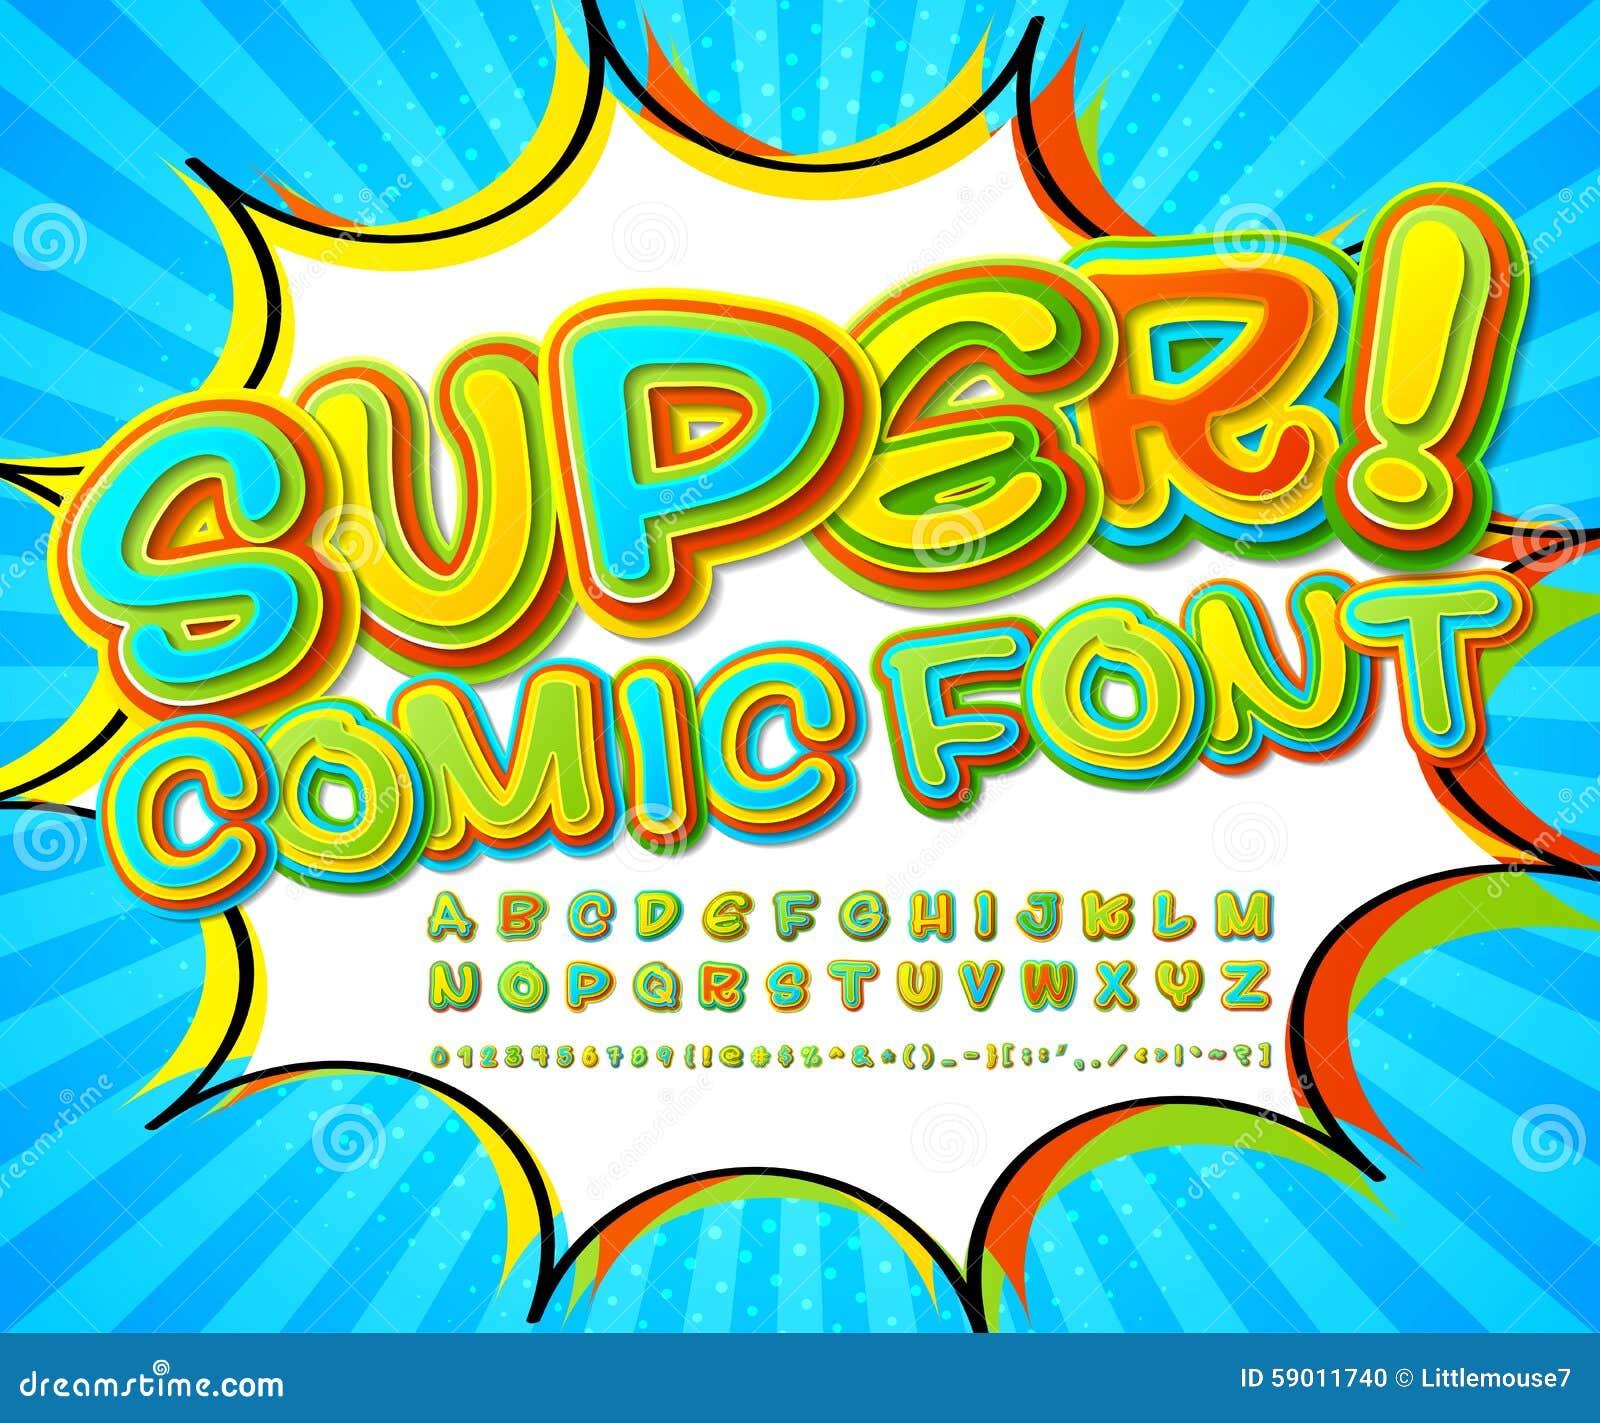 Creative Colorful Comic Font. Alphabet In Style Comics, Pop Art ...